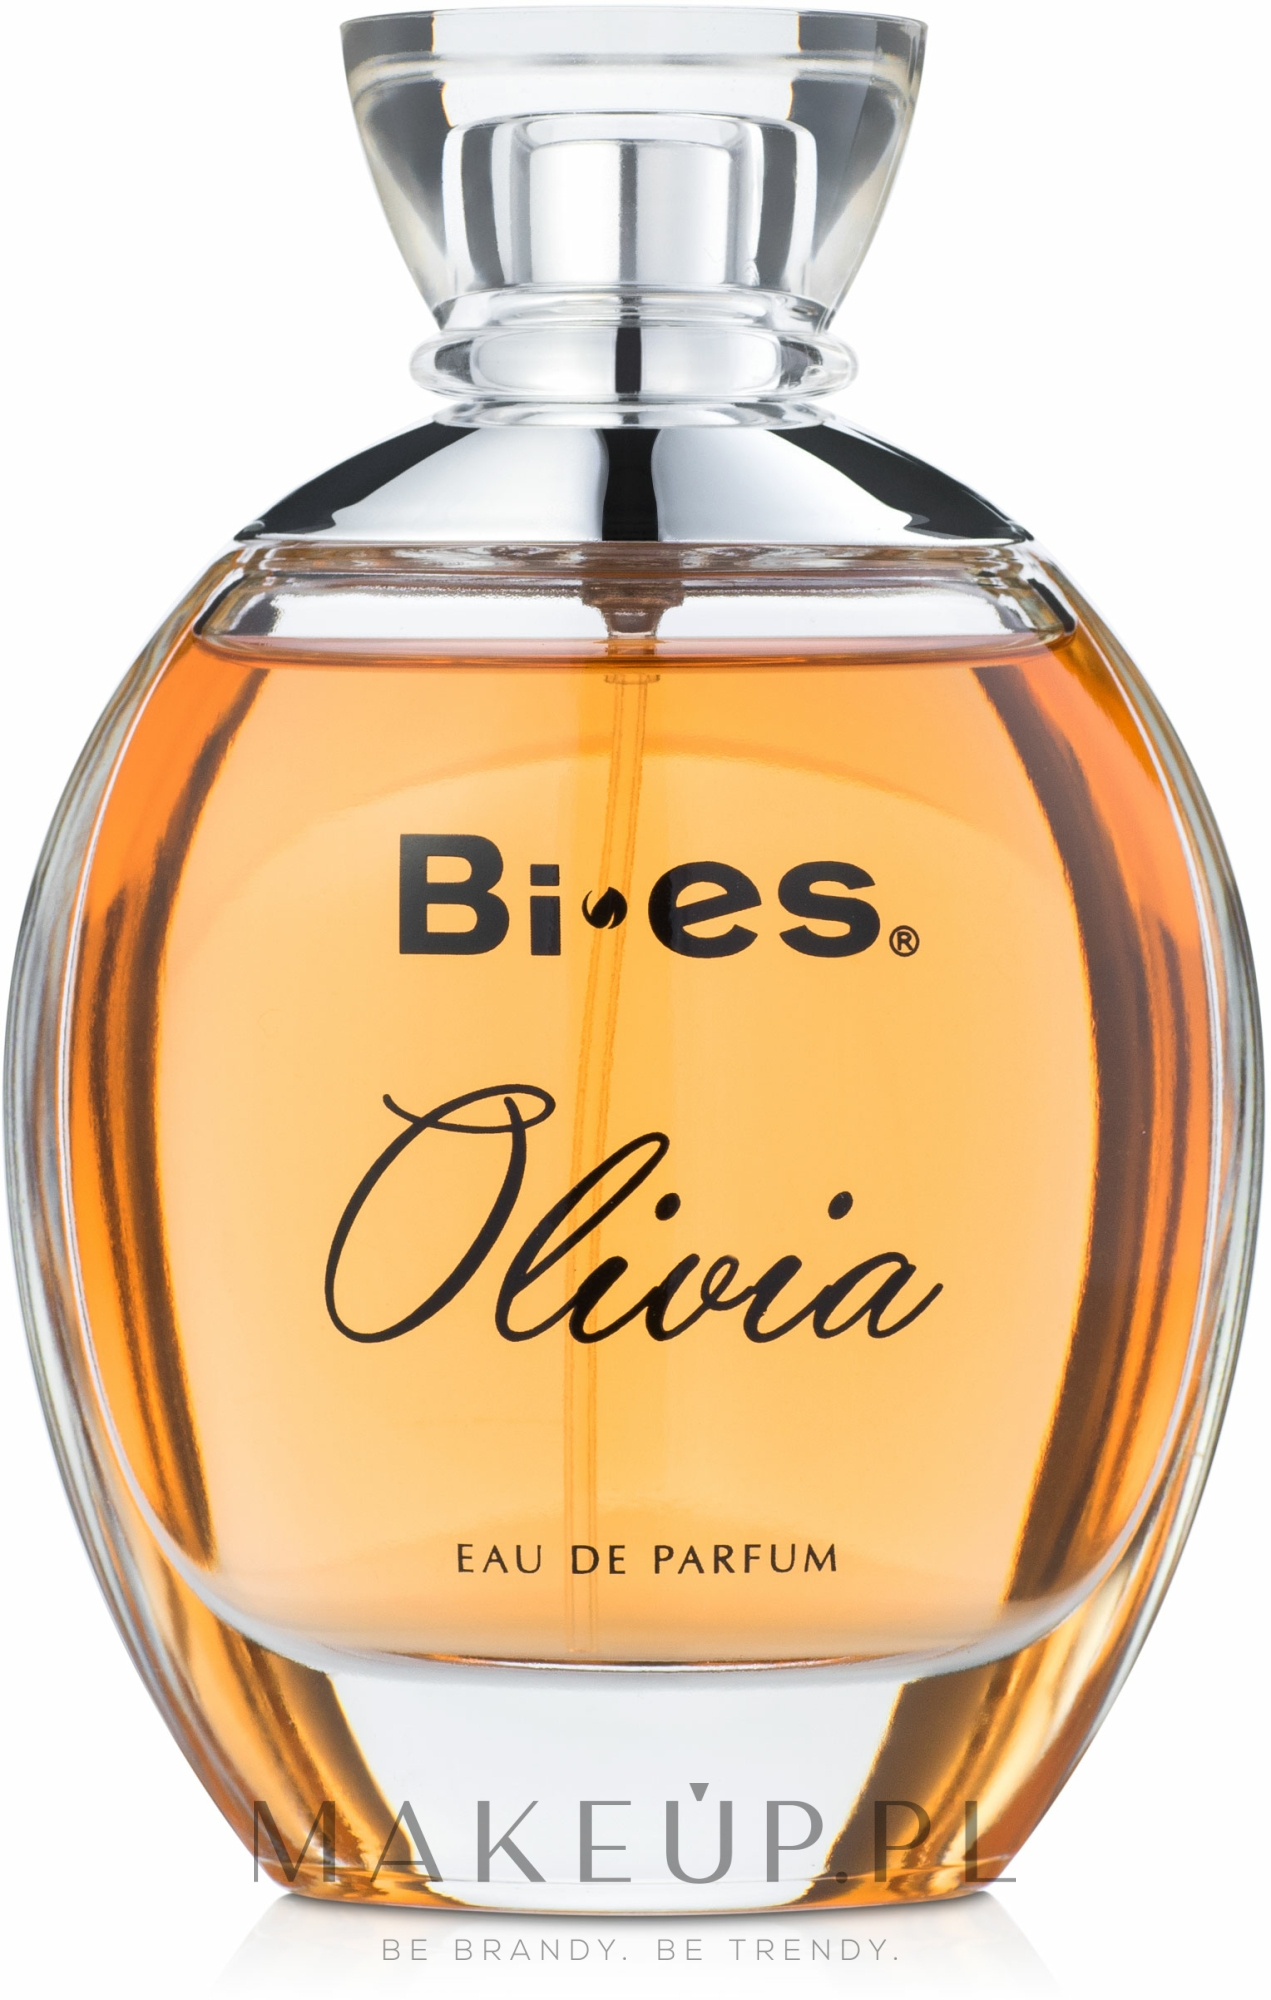 bi-es olivia